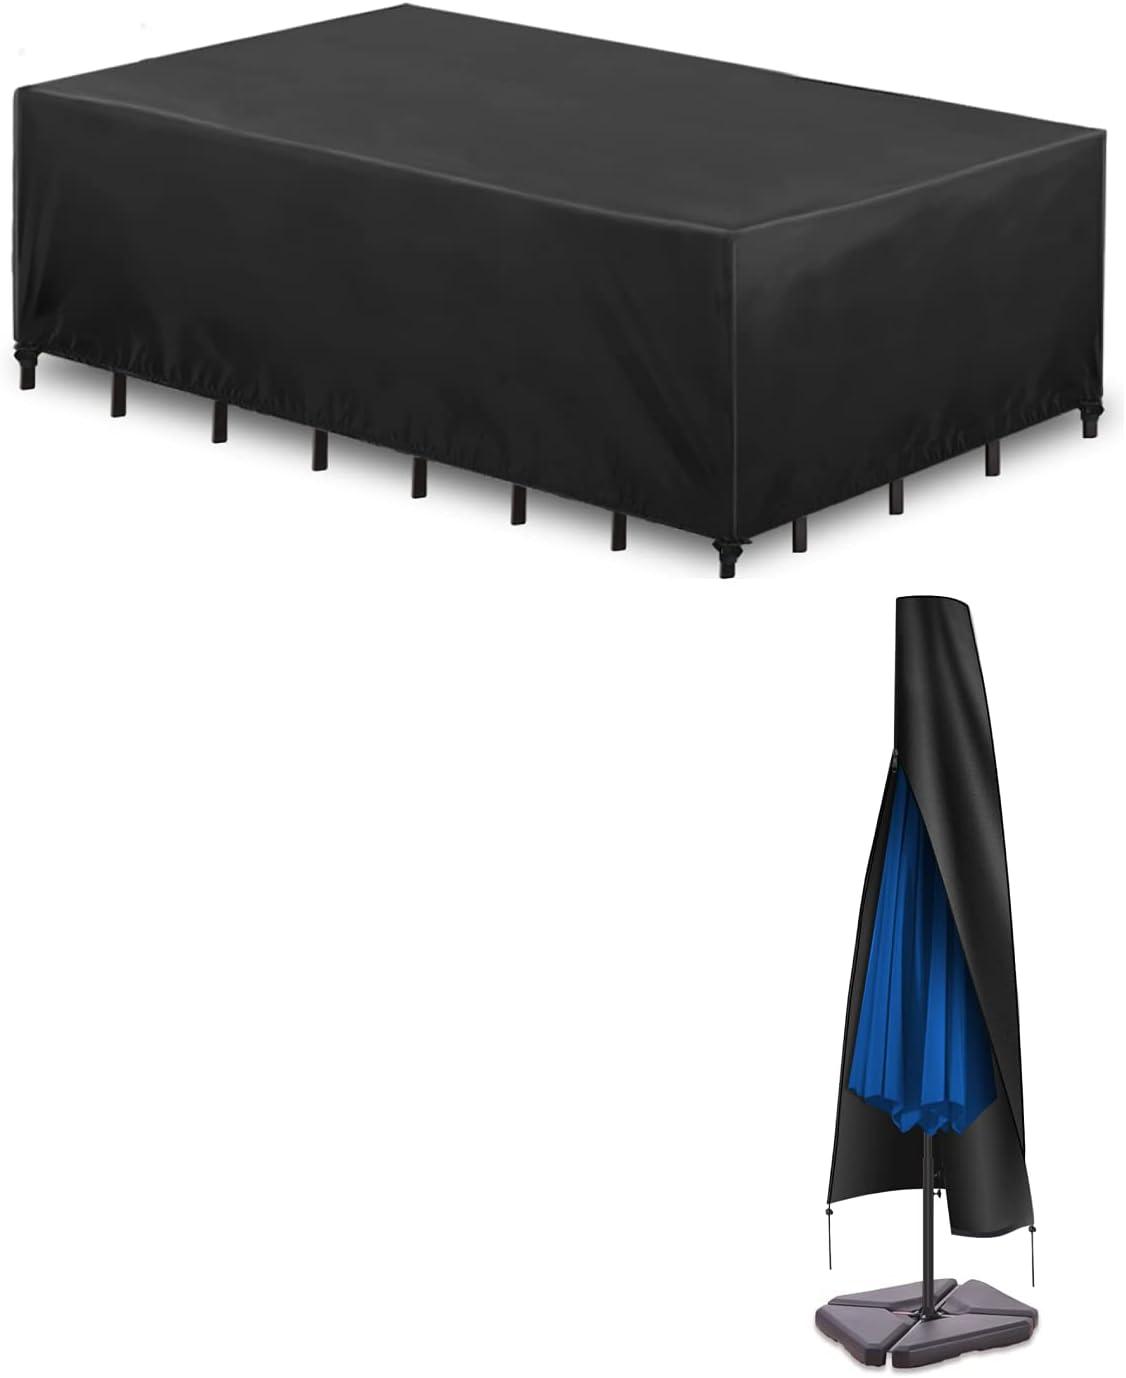 Essort Patio Furniture Large Covers Wa and Umbrella Virginia Beach Mall Garden Cover Cheap sale